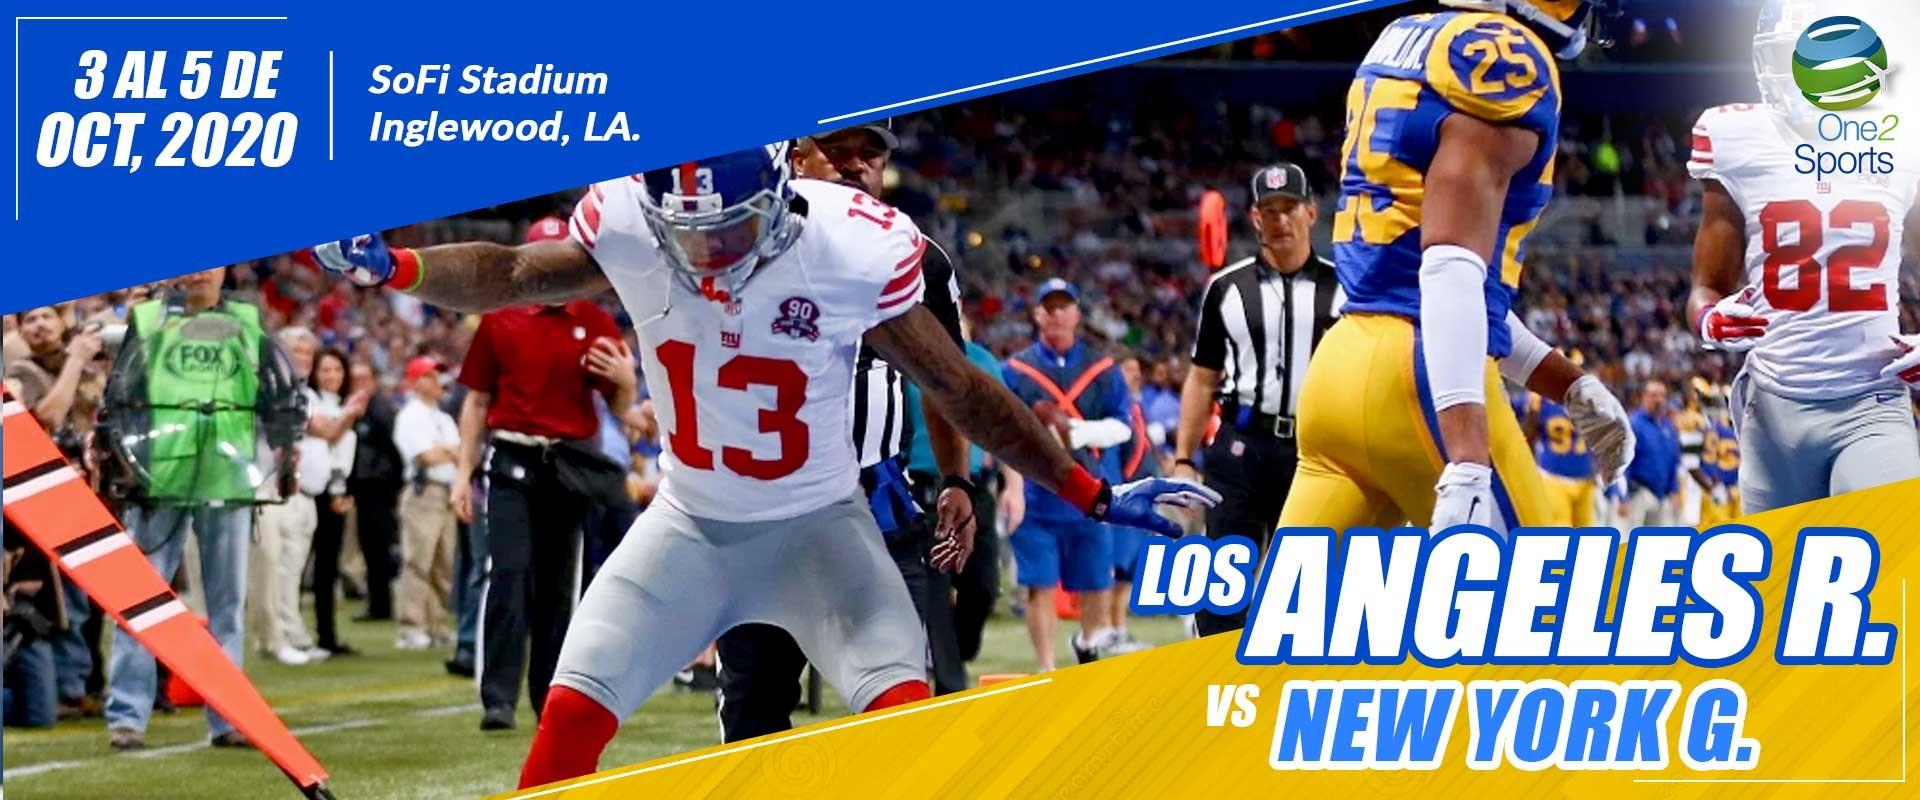 Los Angeles R vs New York G